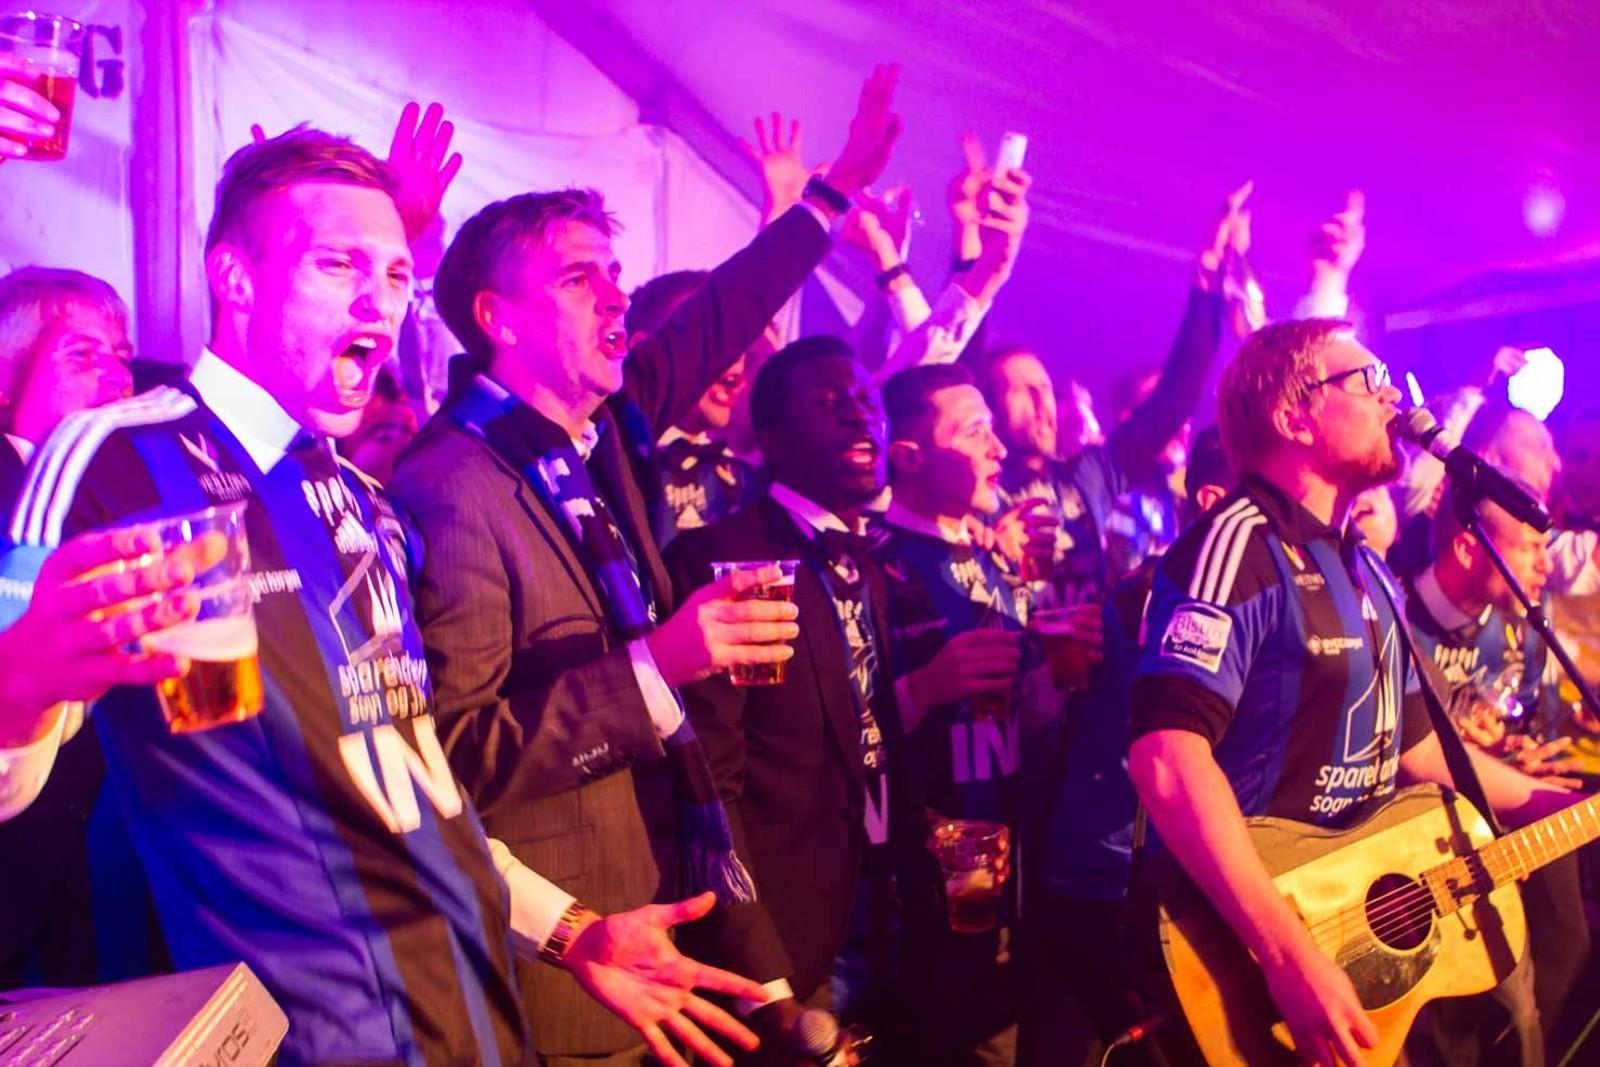 Fotballfesten i Florø. Fotballfesten i Florø.